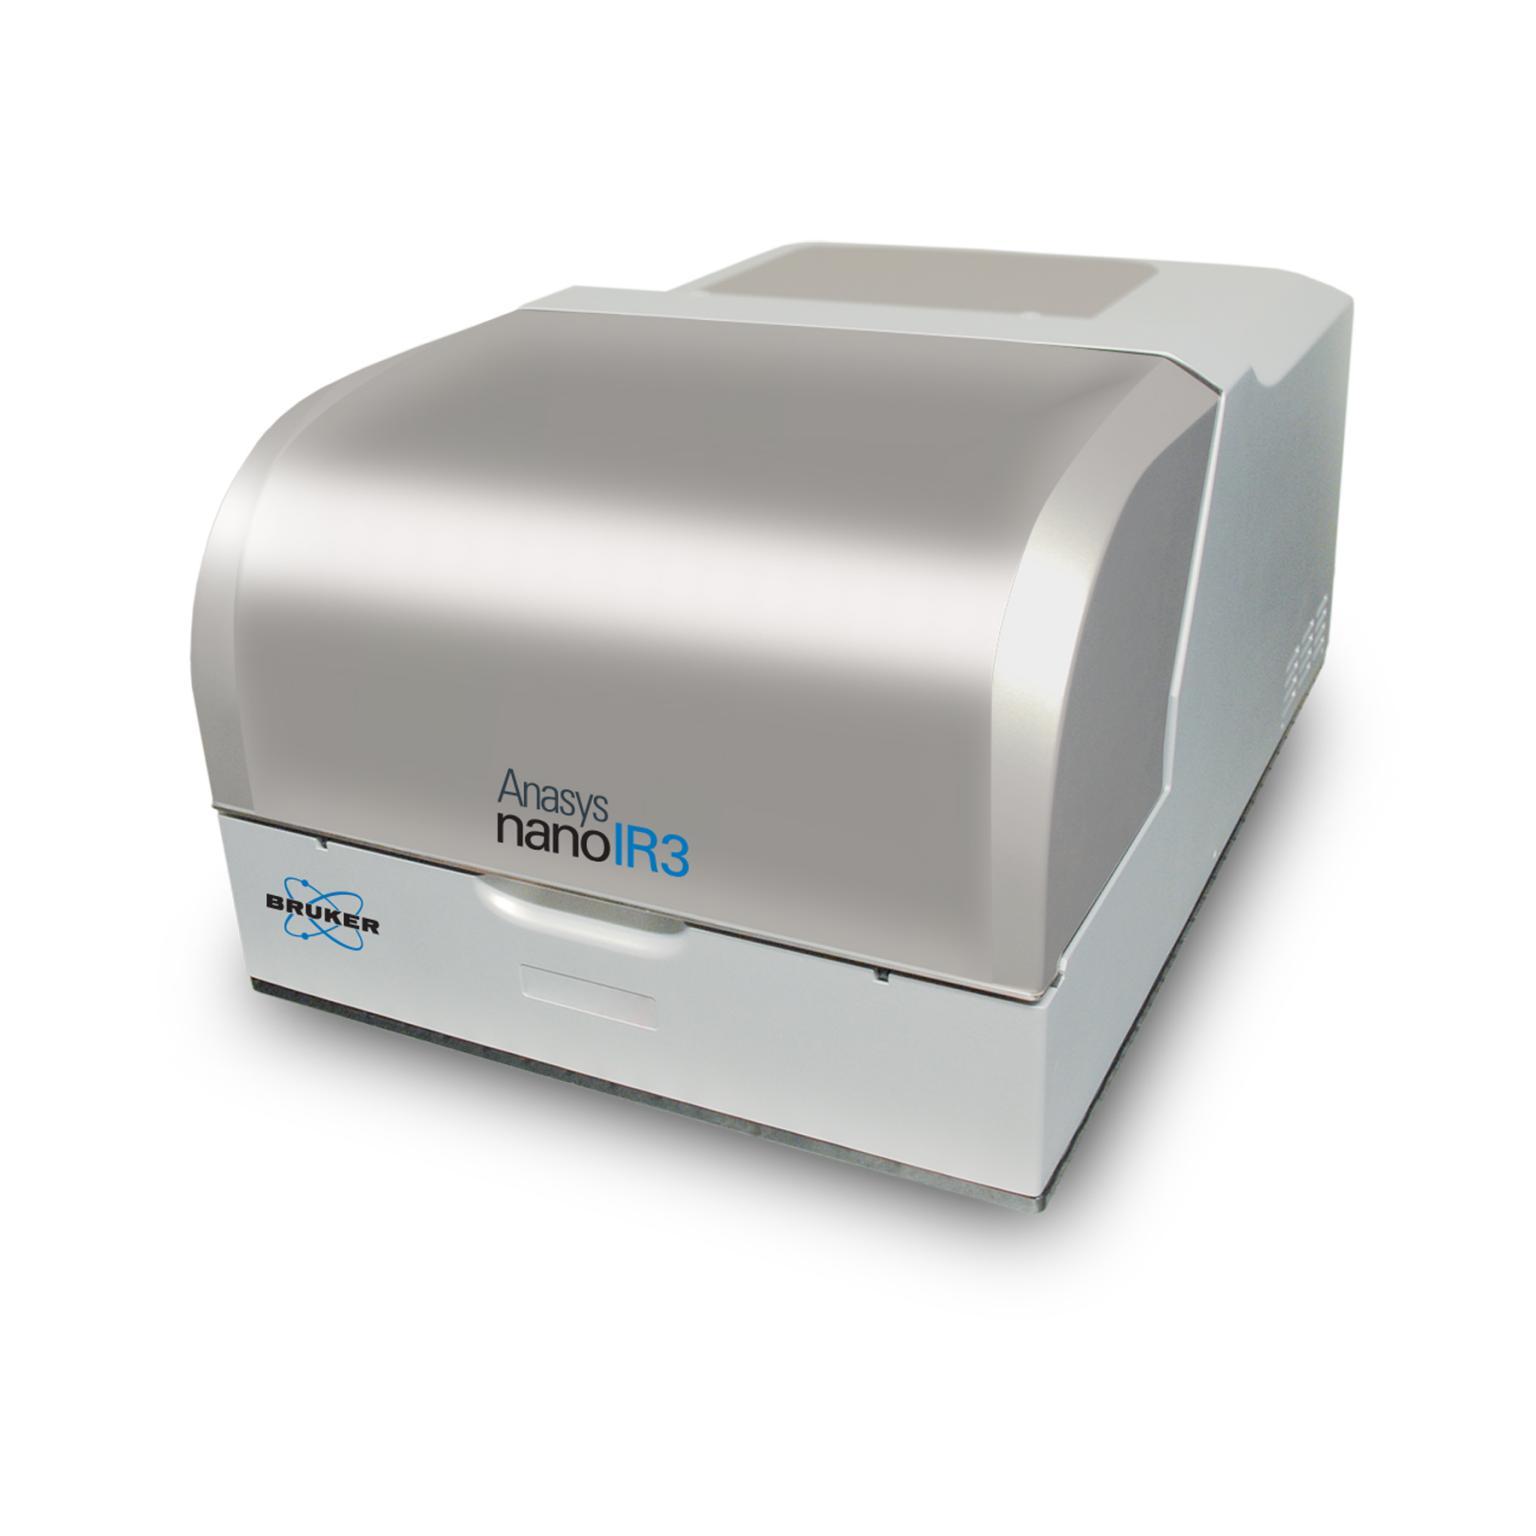 Anasys nanoIR3 Spectrometer